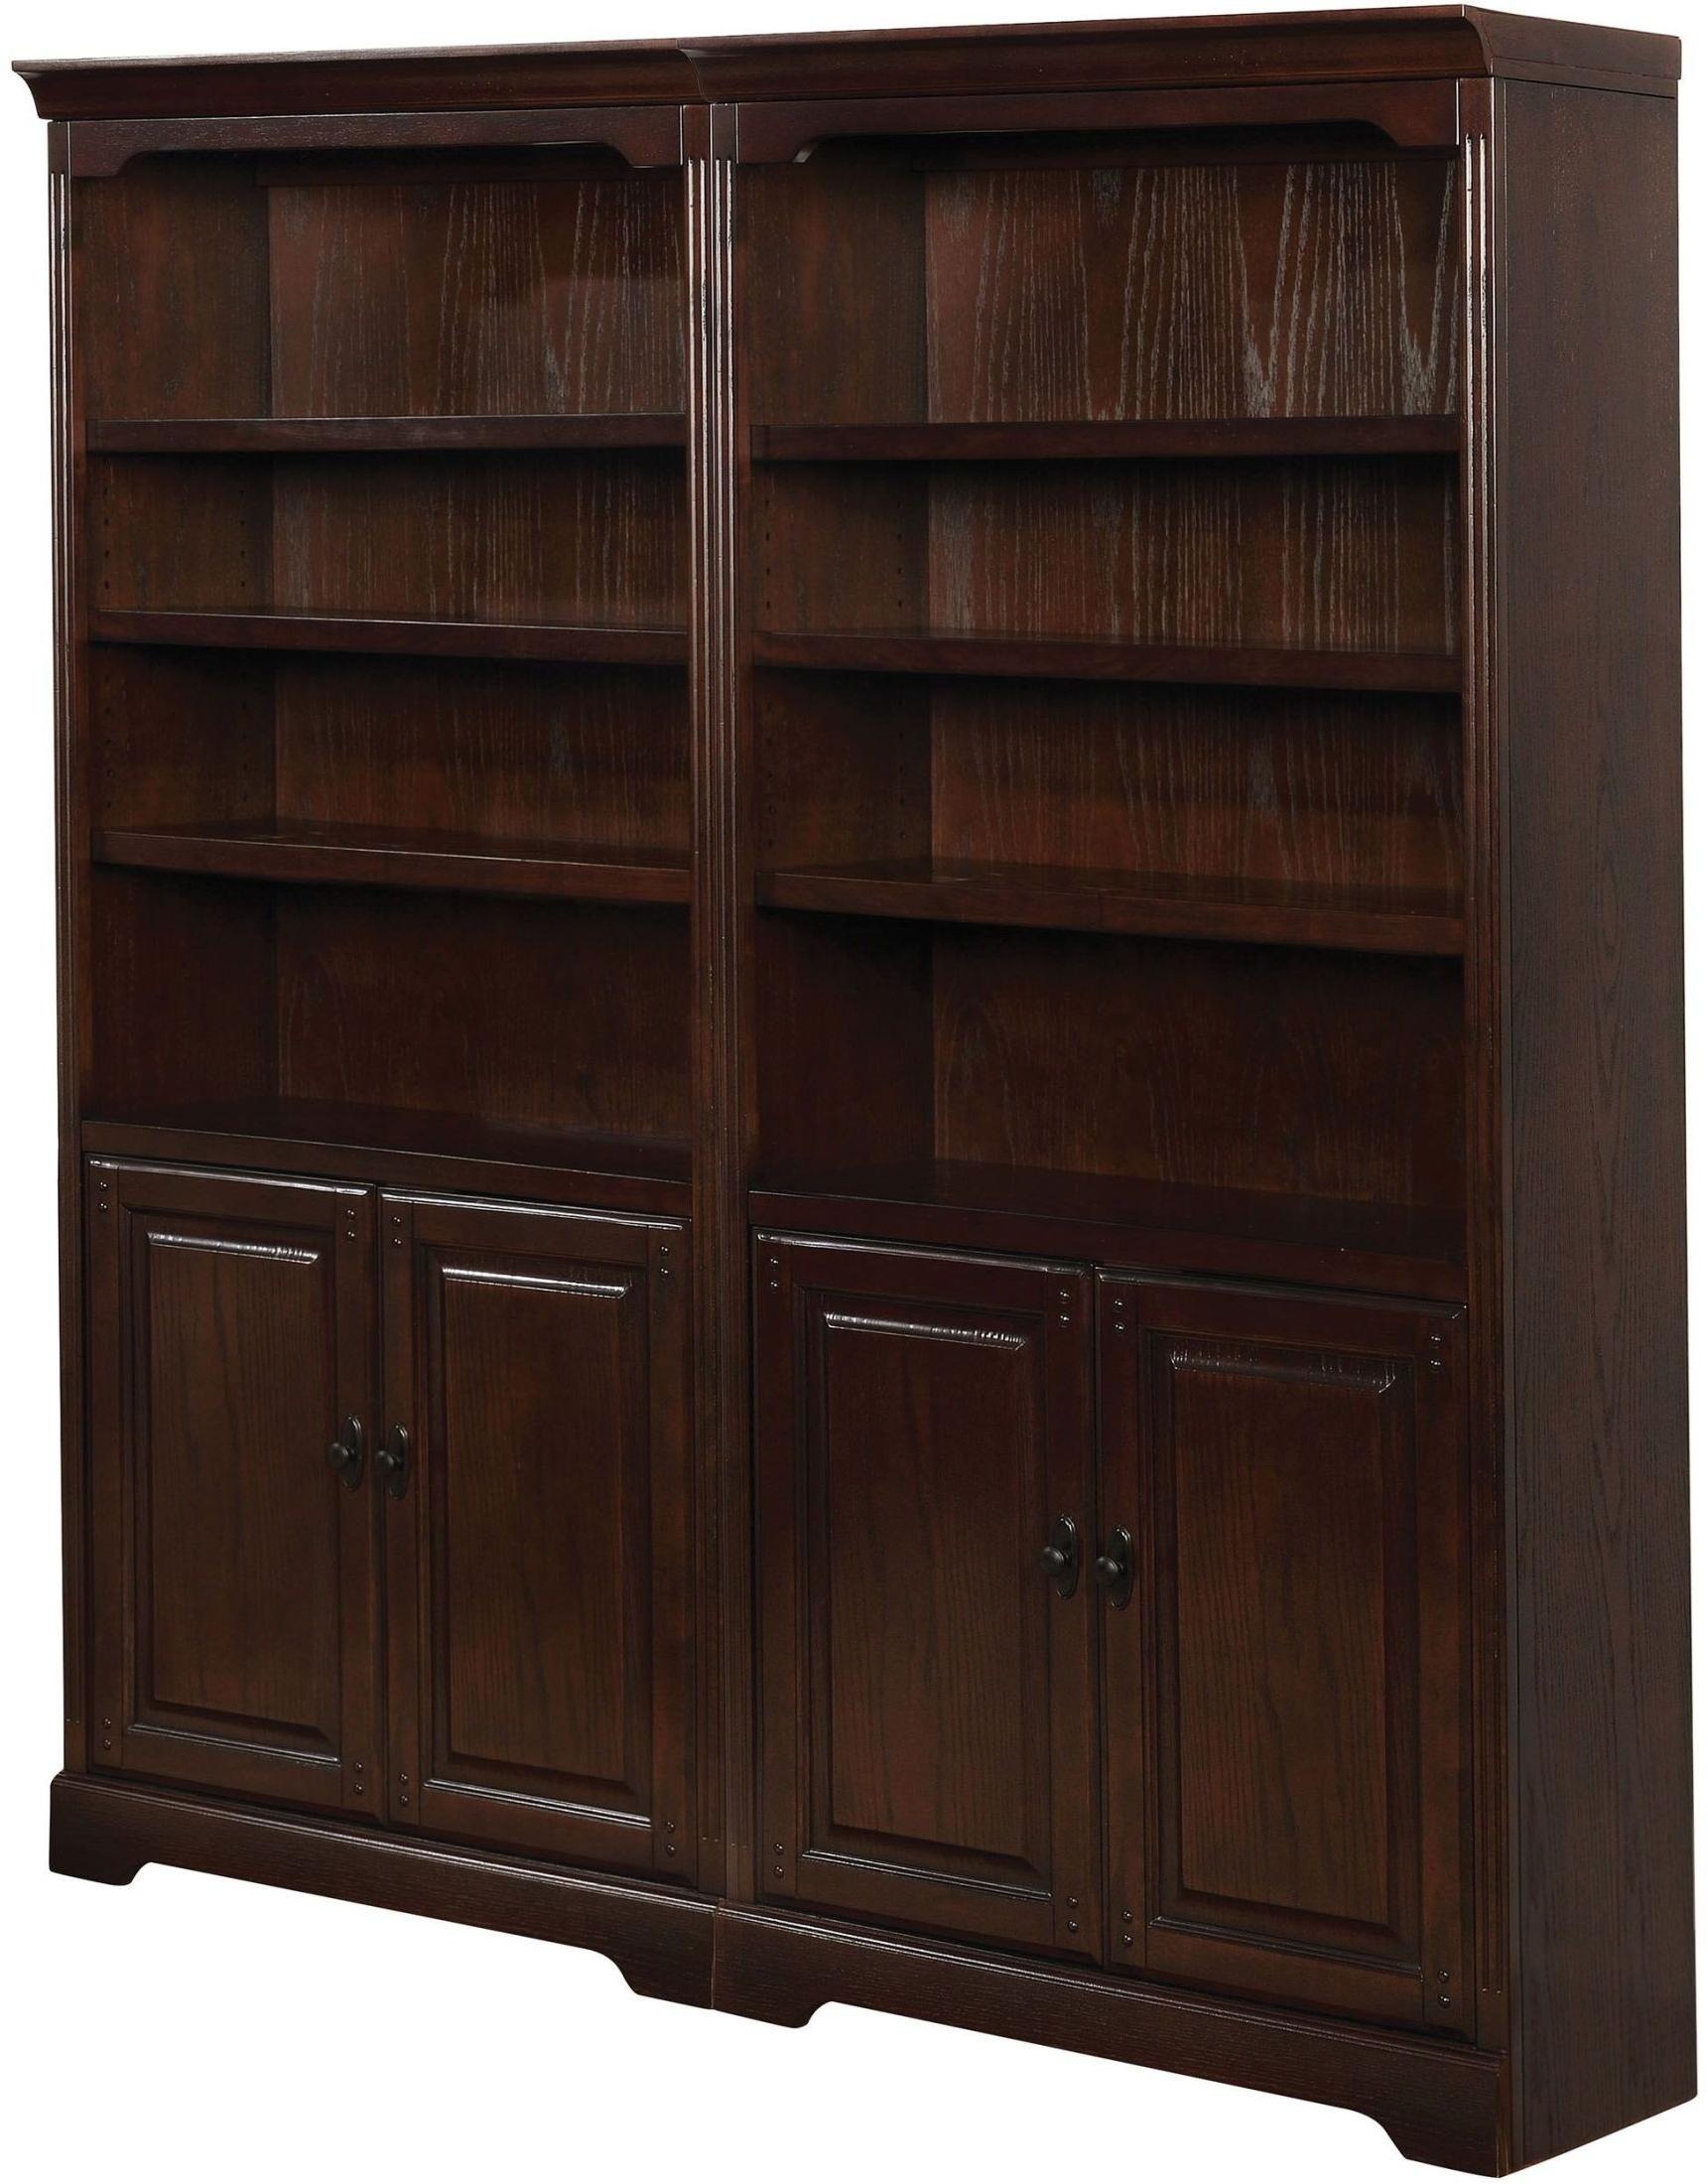 Famous Tami Standard Bookcases With Regard To Tami Dark Walnut Book Shelf (View 10 of 20)